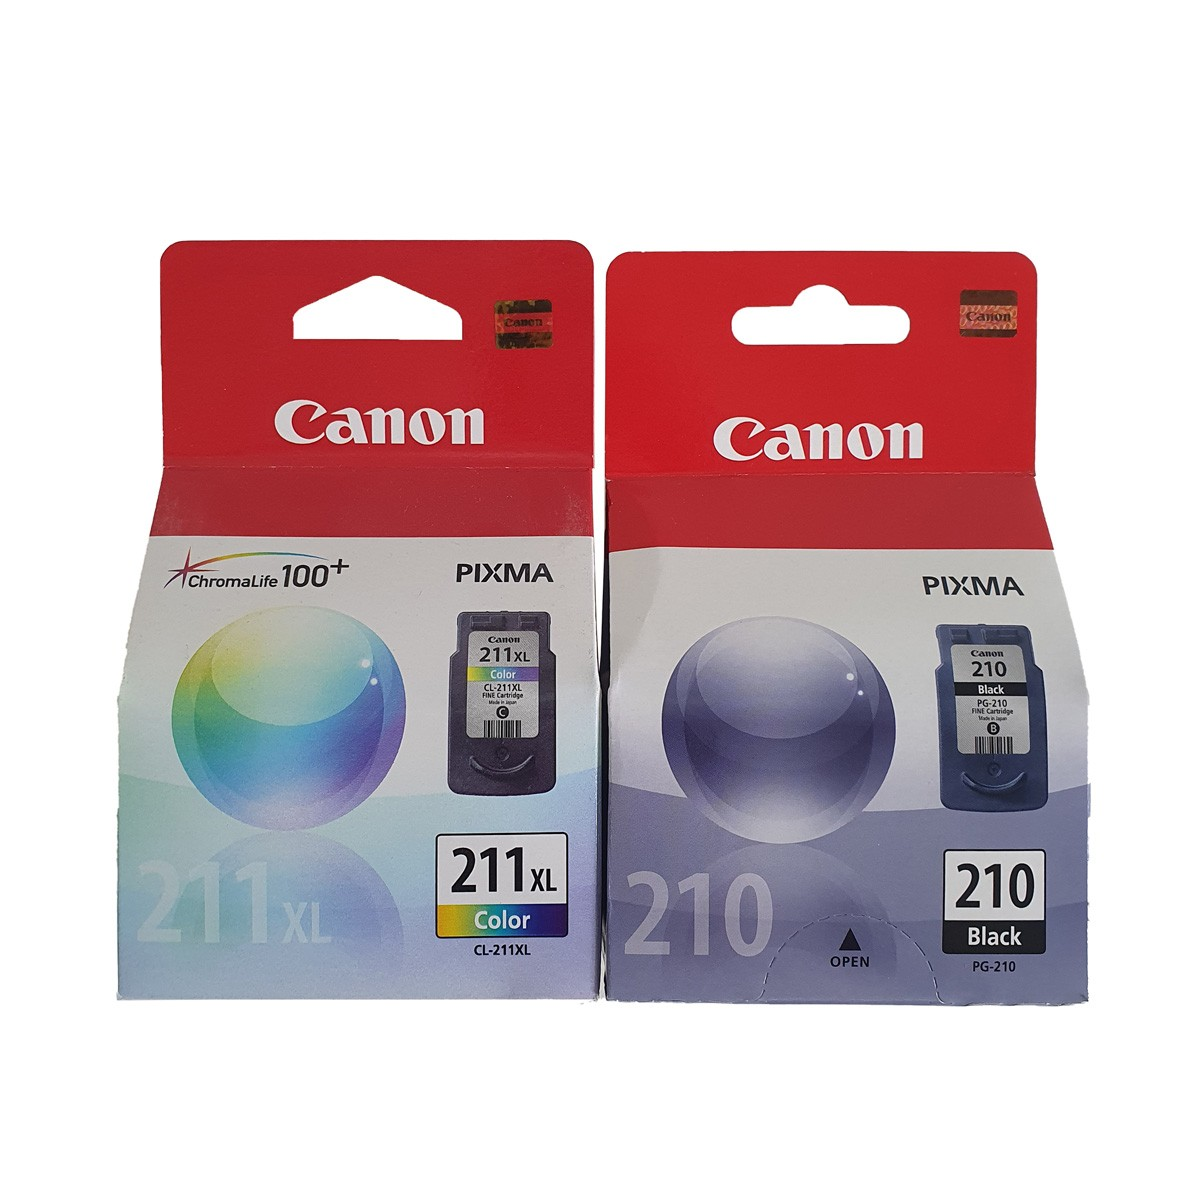 Kit 2 cartuchos Canon PG210 Preto e CL211XL Colorido para MP240 MP250 MP260 MP490 MP480